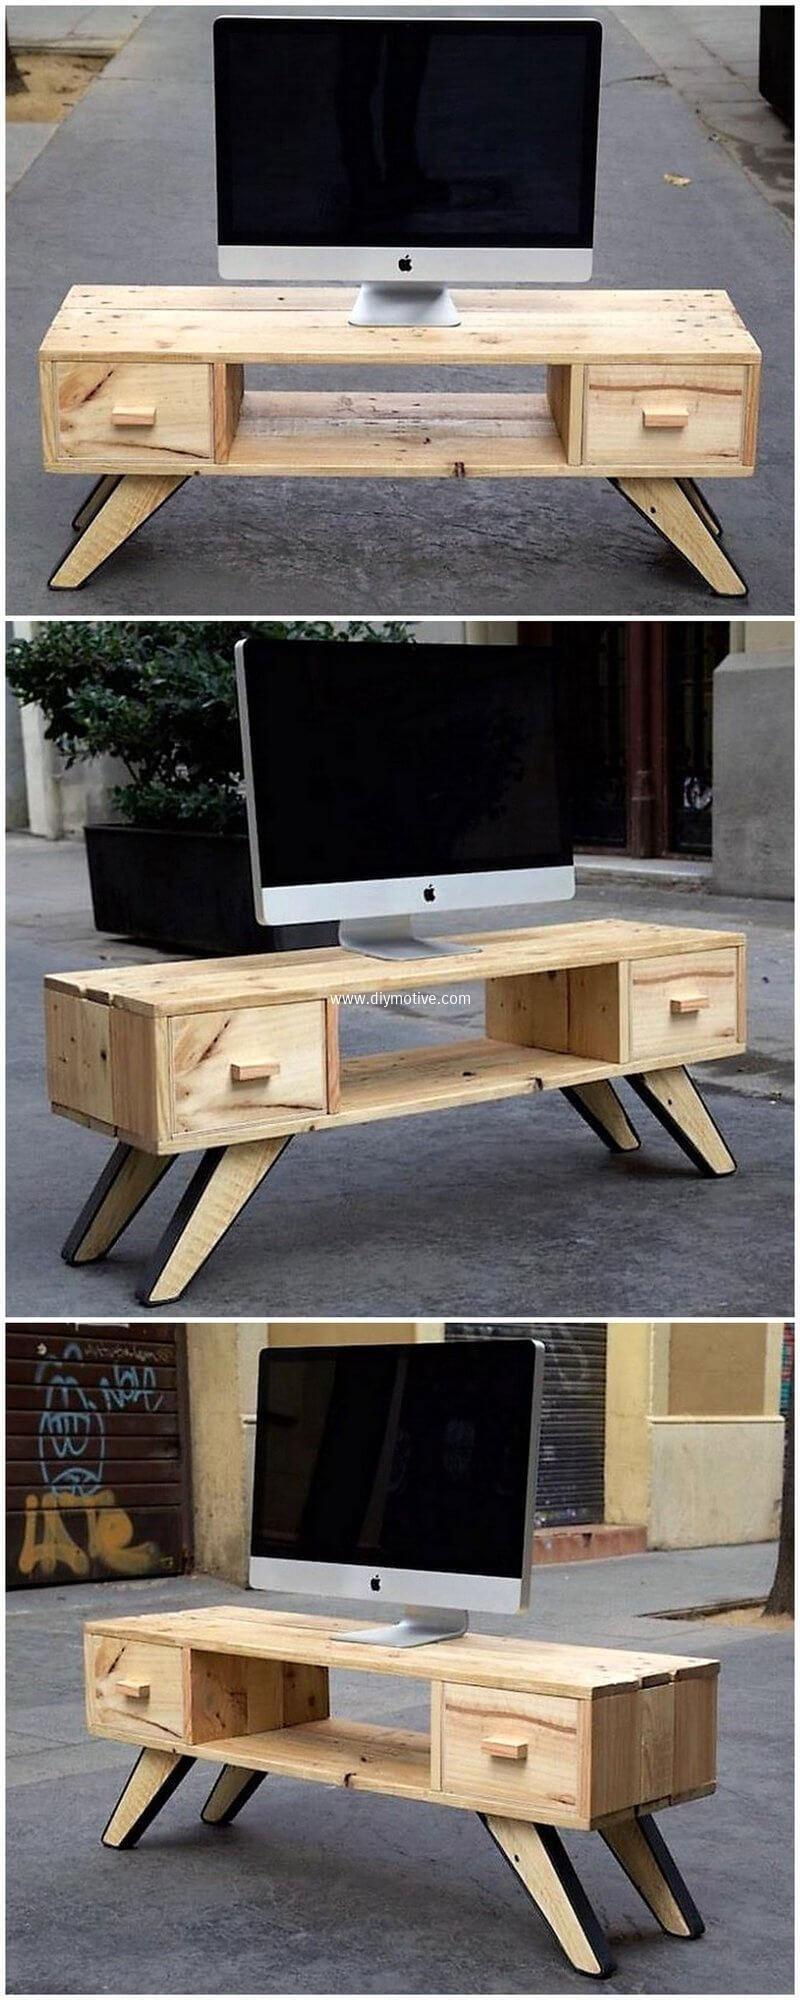 wood pallet made tv stand tv stand diy ideas in 2018 pinterest rh pinterest com